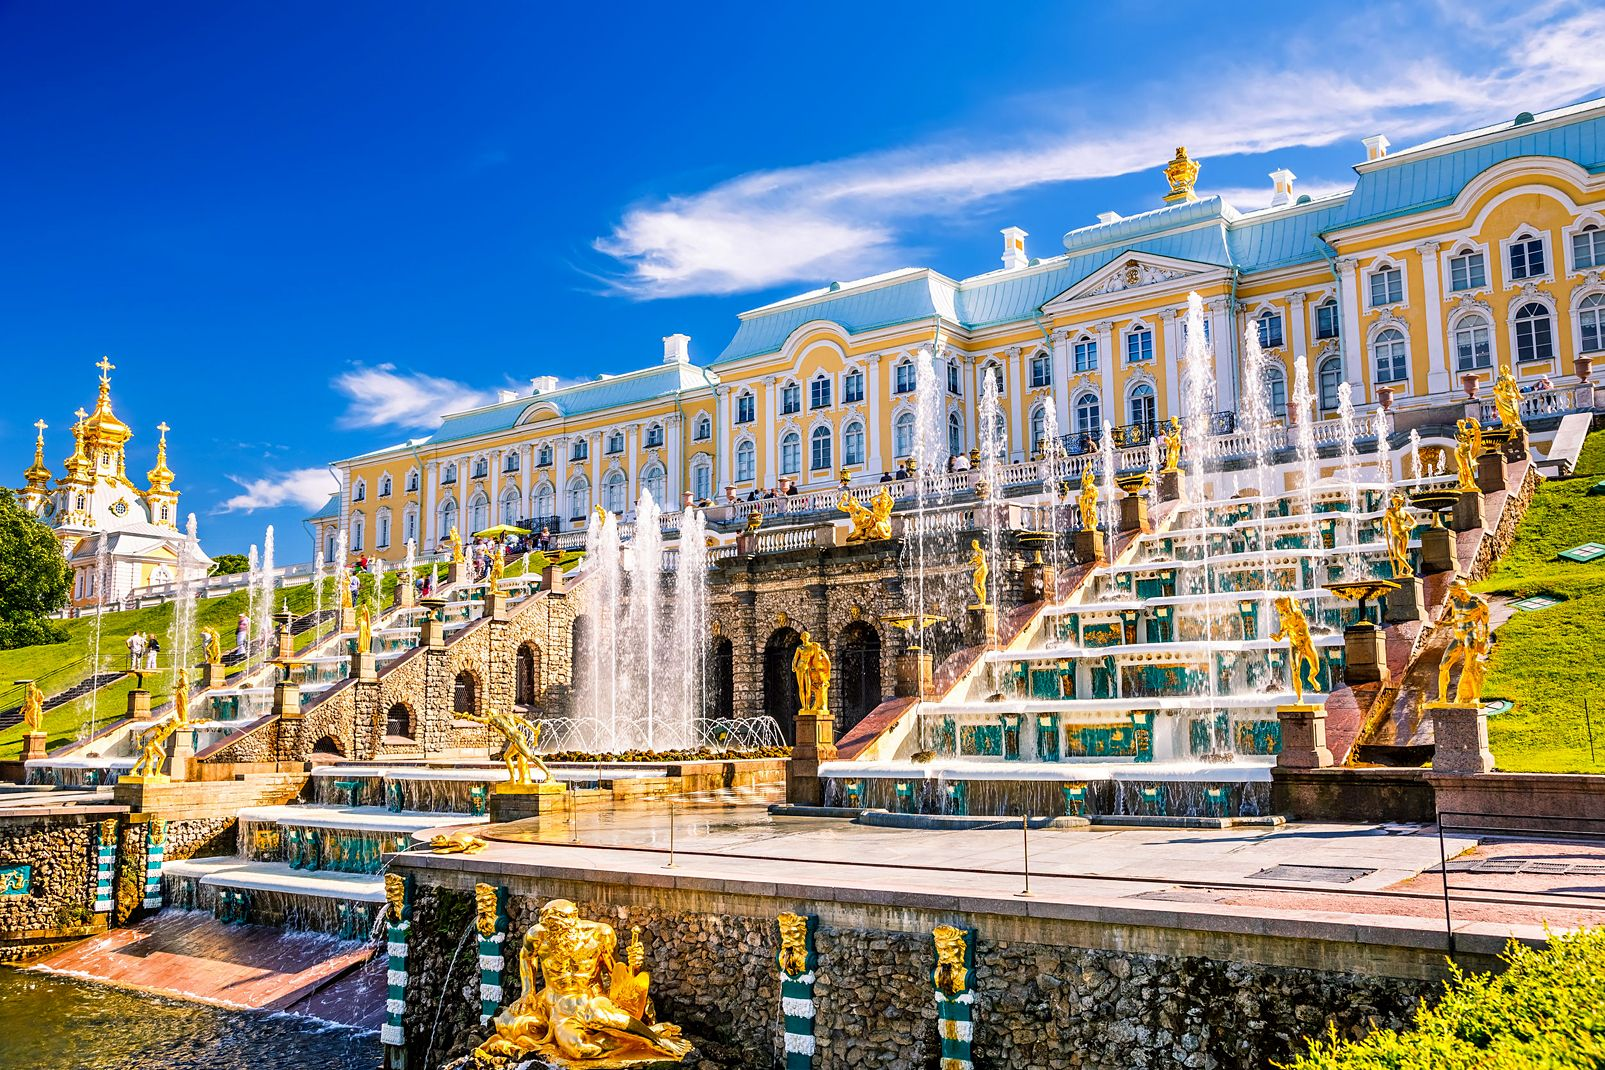 Russie, La grande fontaine en cas cascade de Peterhof